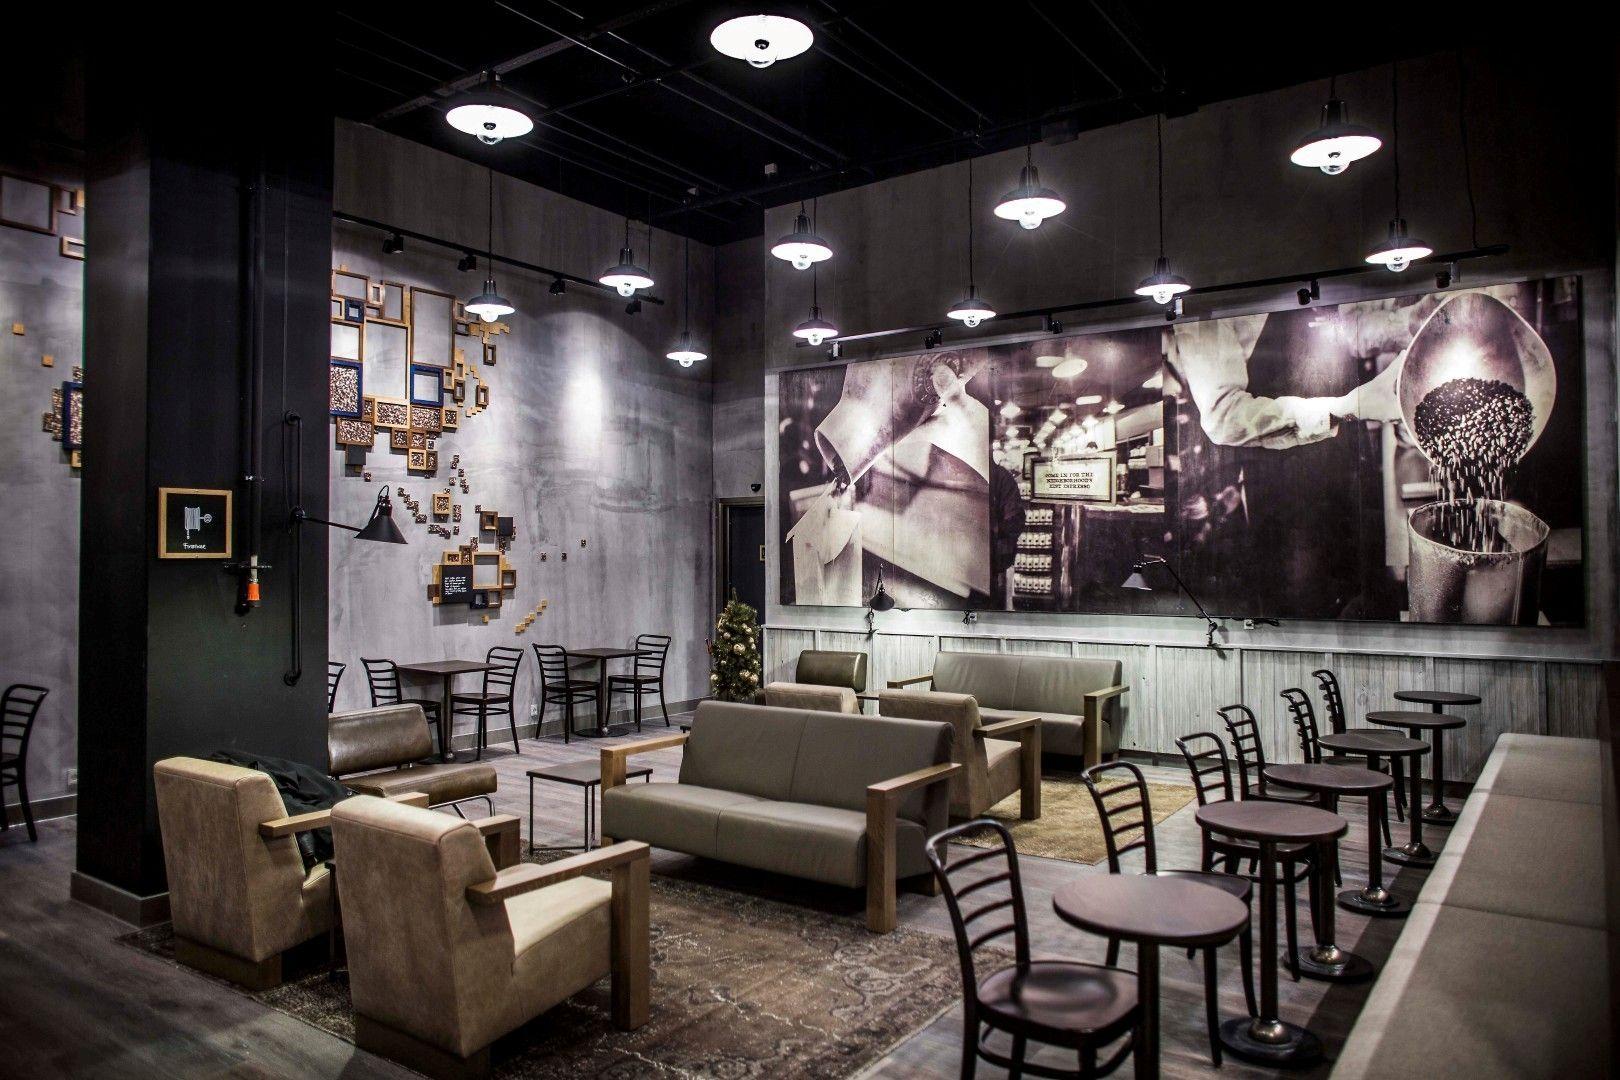 bilka shopping mall, copenhagen, denmark starbucks coffee emea ... - Cafe Mit Buchladen Innendesign Bilder